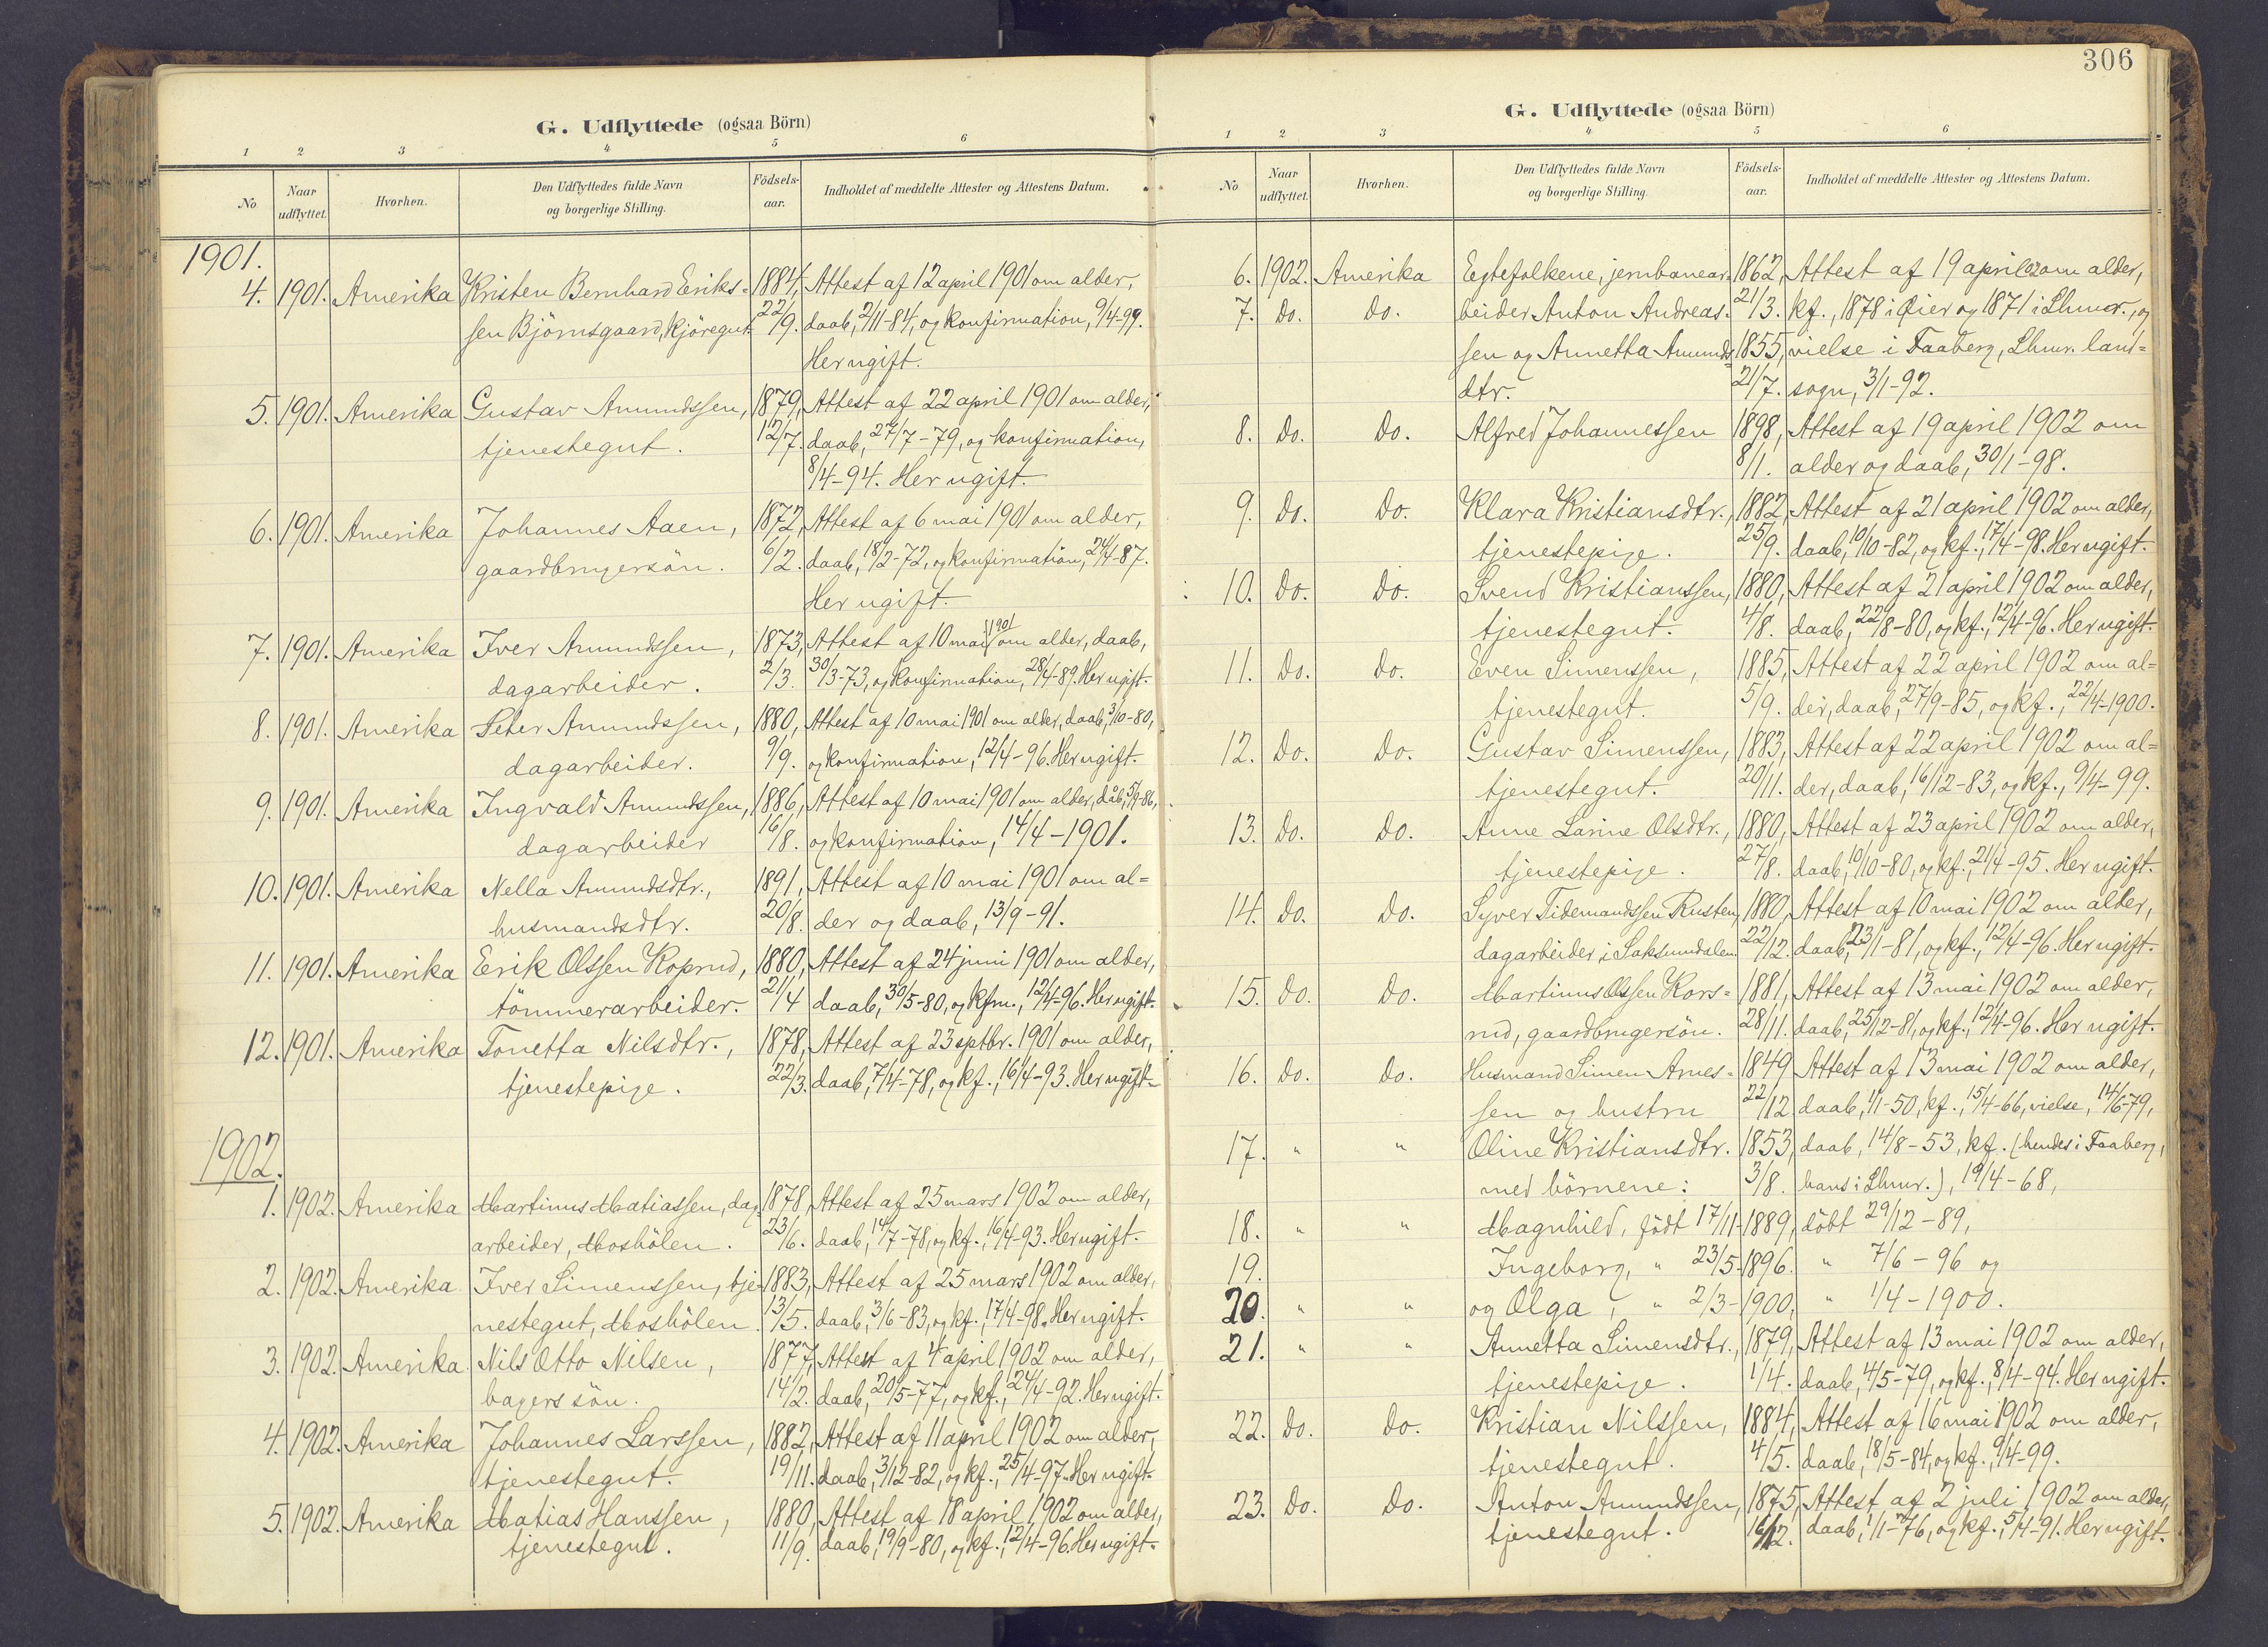 SAH, Fåberg prestekontor, Ministerialbok nr. 12, 1899-1915, s. 306